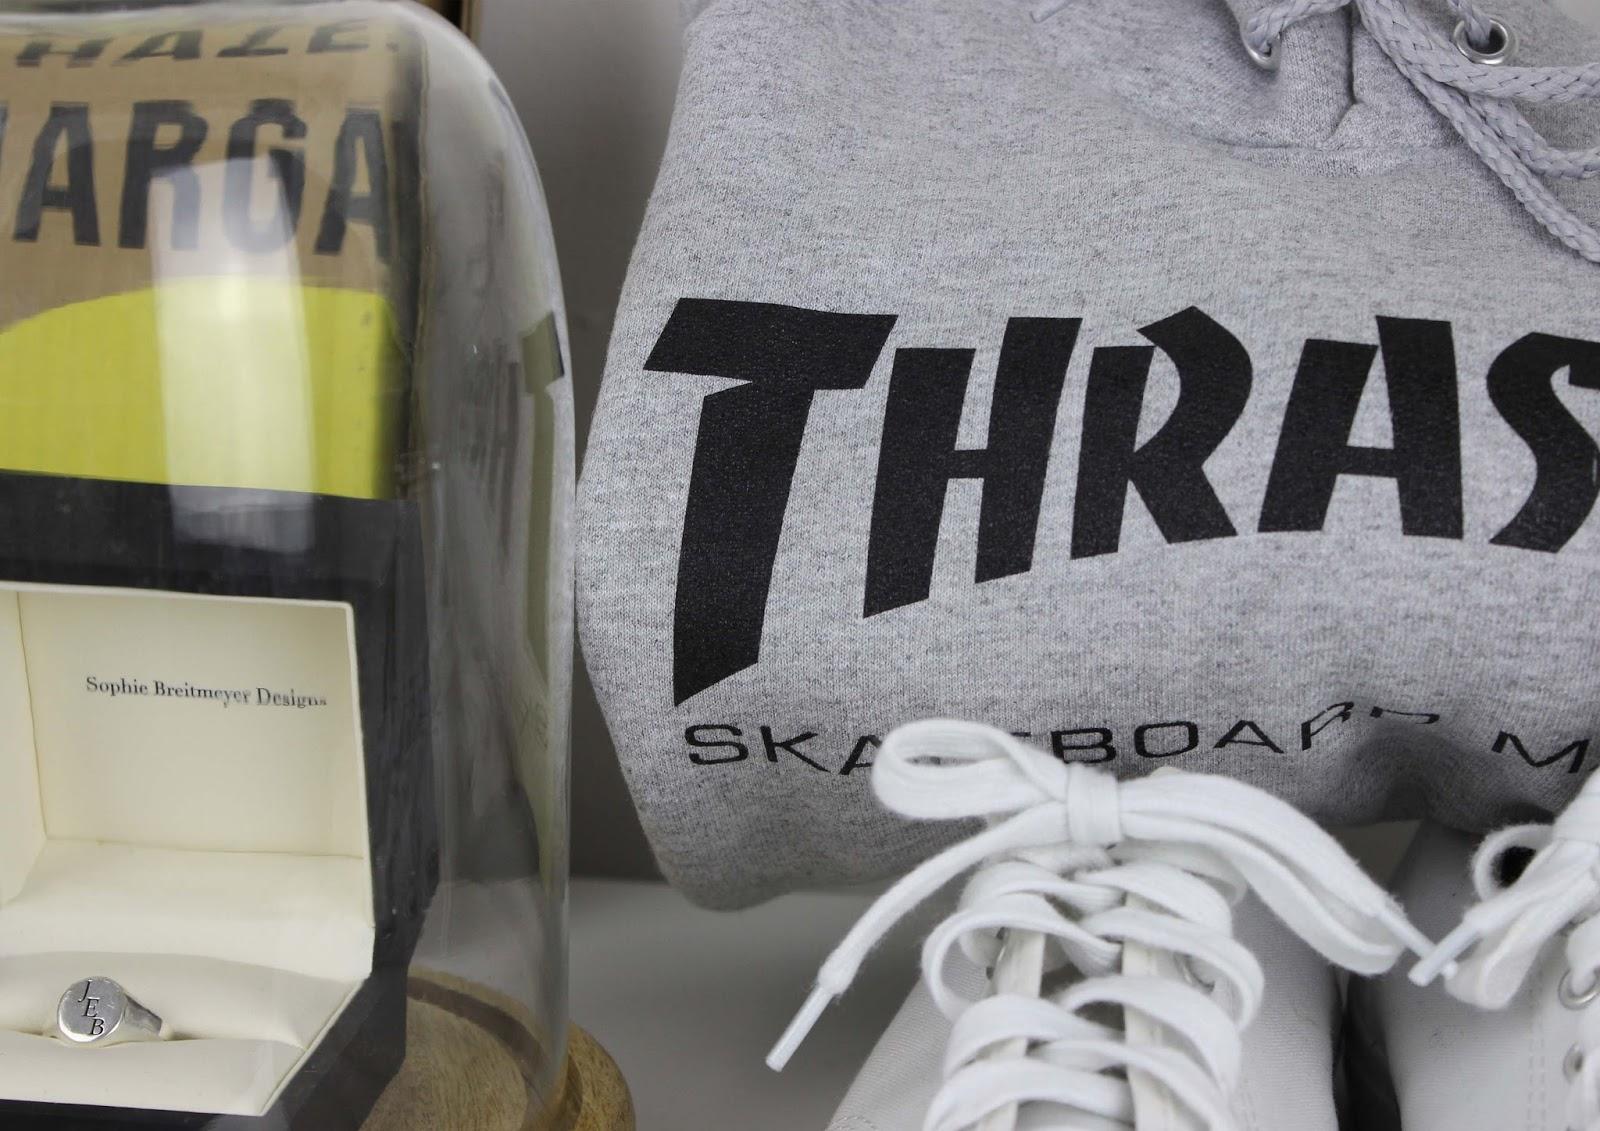 Sophie Breitmeyer designs and Thrasher skateboard magazine from skate pharmacy